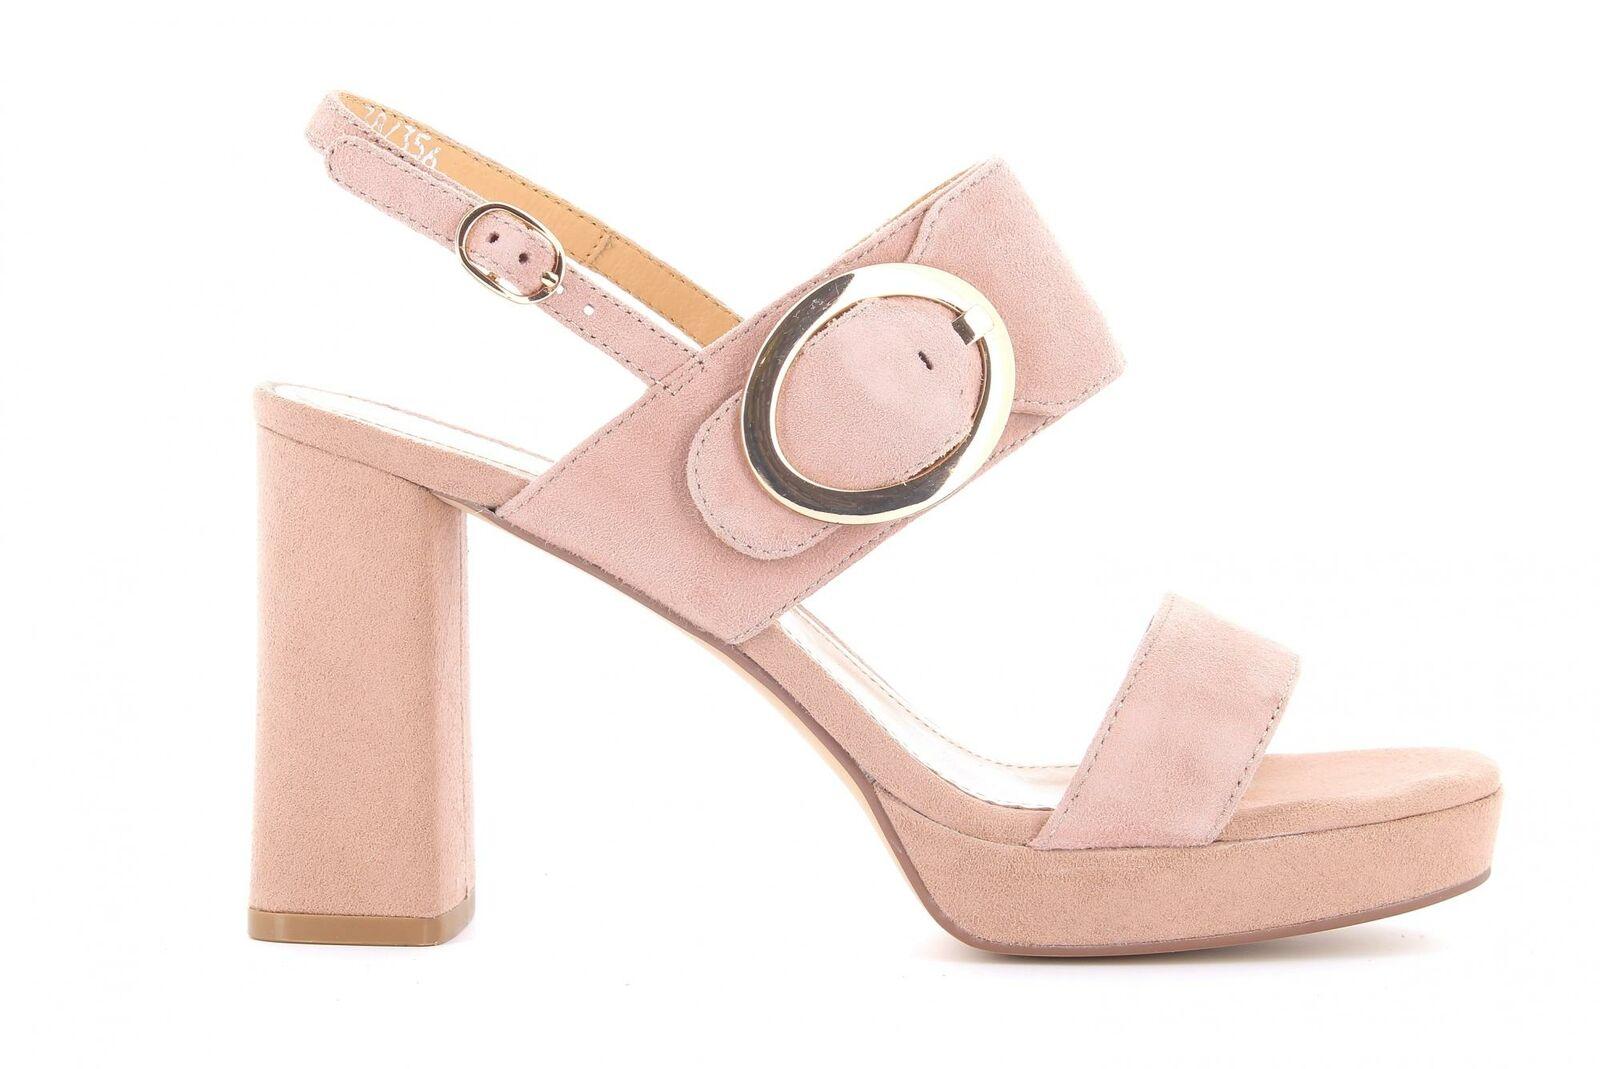 Adele Dezotti P19us damen schuhe AV2904P NUDE high-heeled sandals